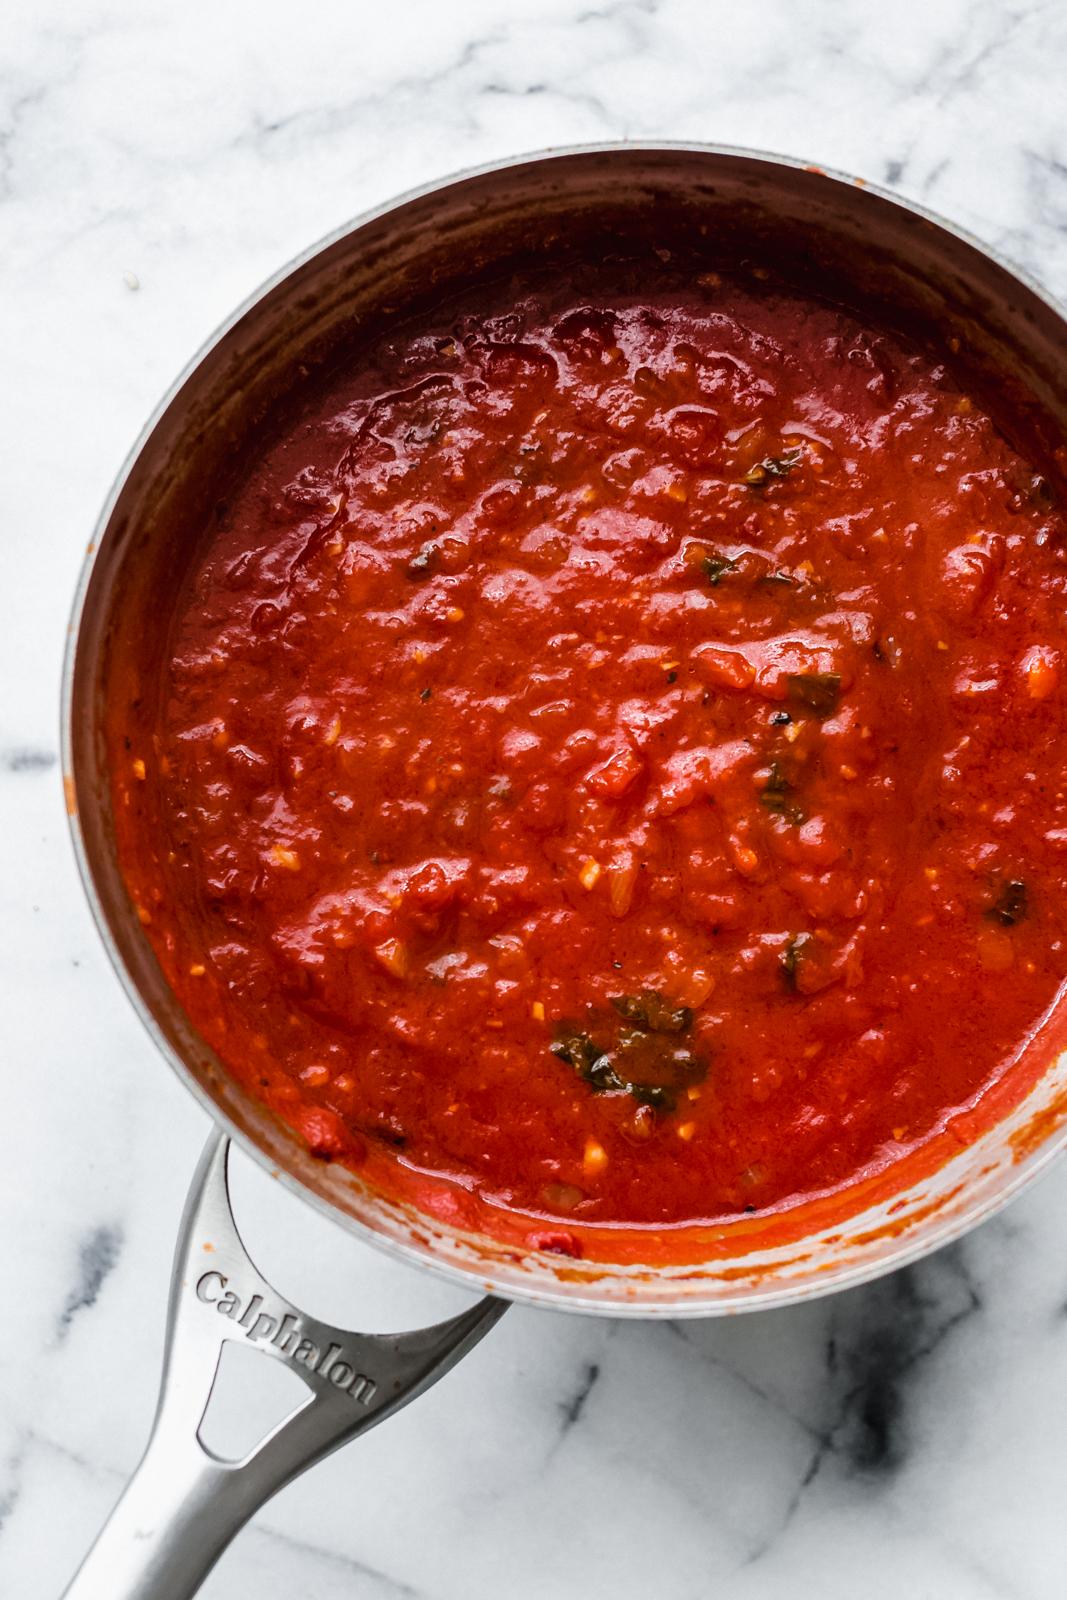 prepared arrabbiata sauce in sauce pot